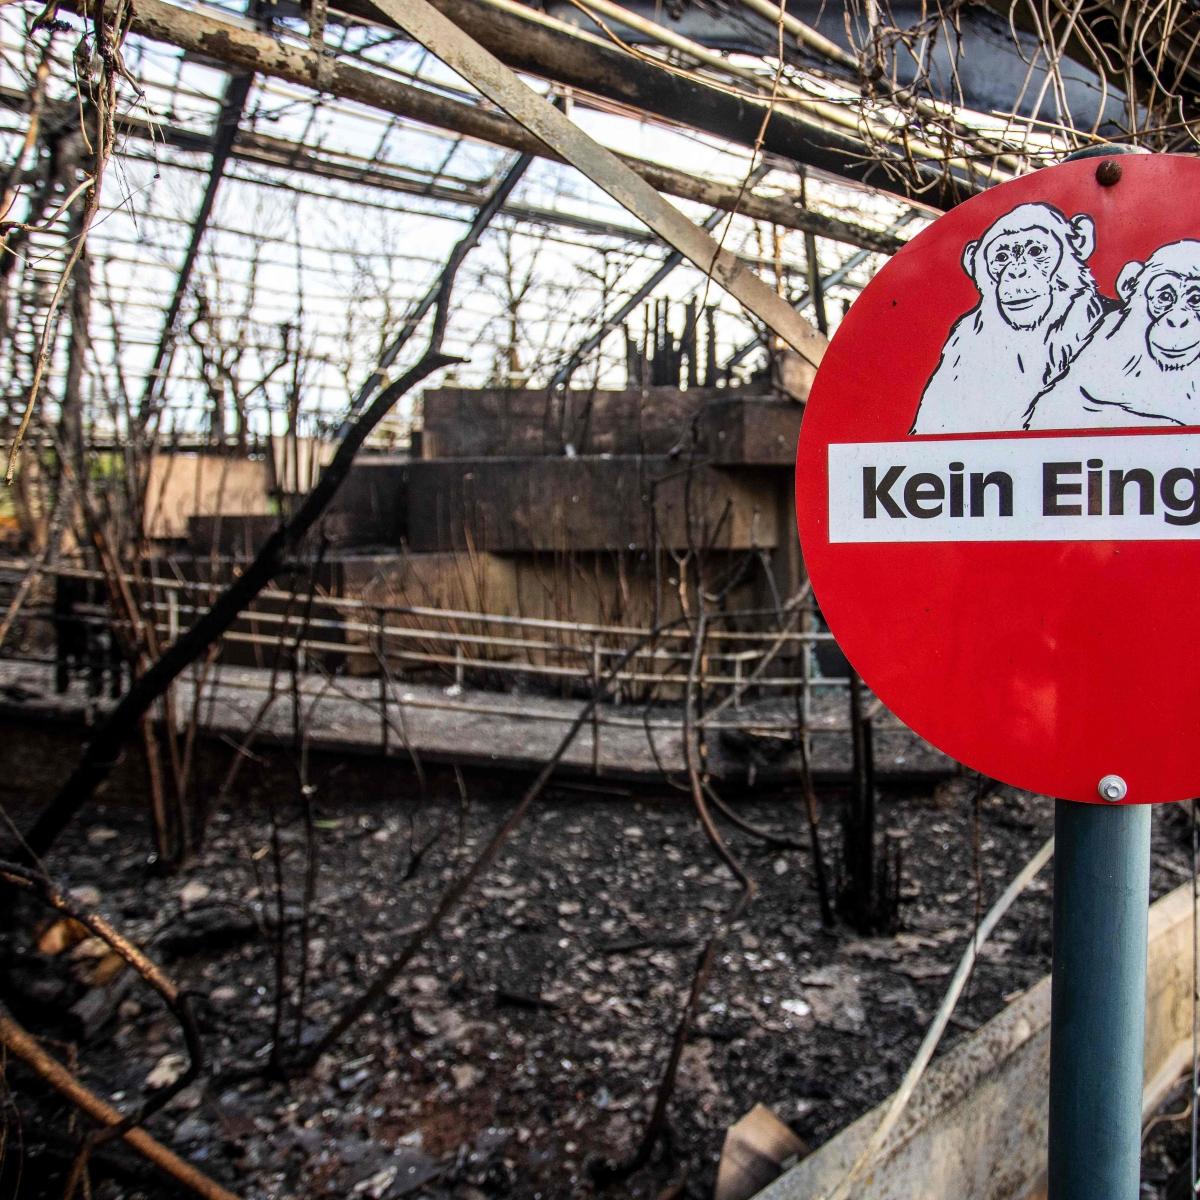 German zoo fire kills dozens of chimps, orangutans & gorillas